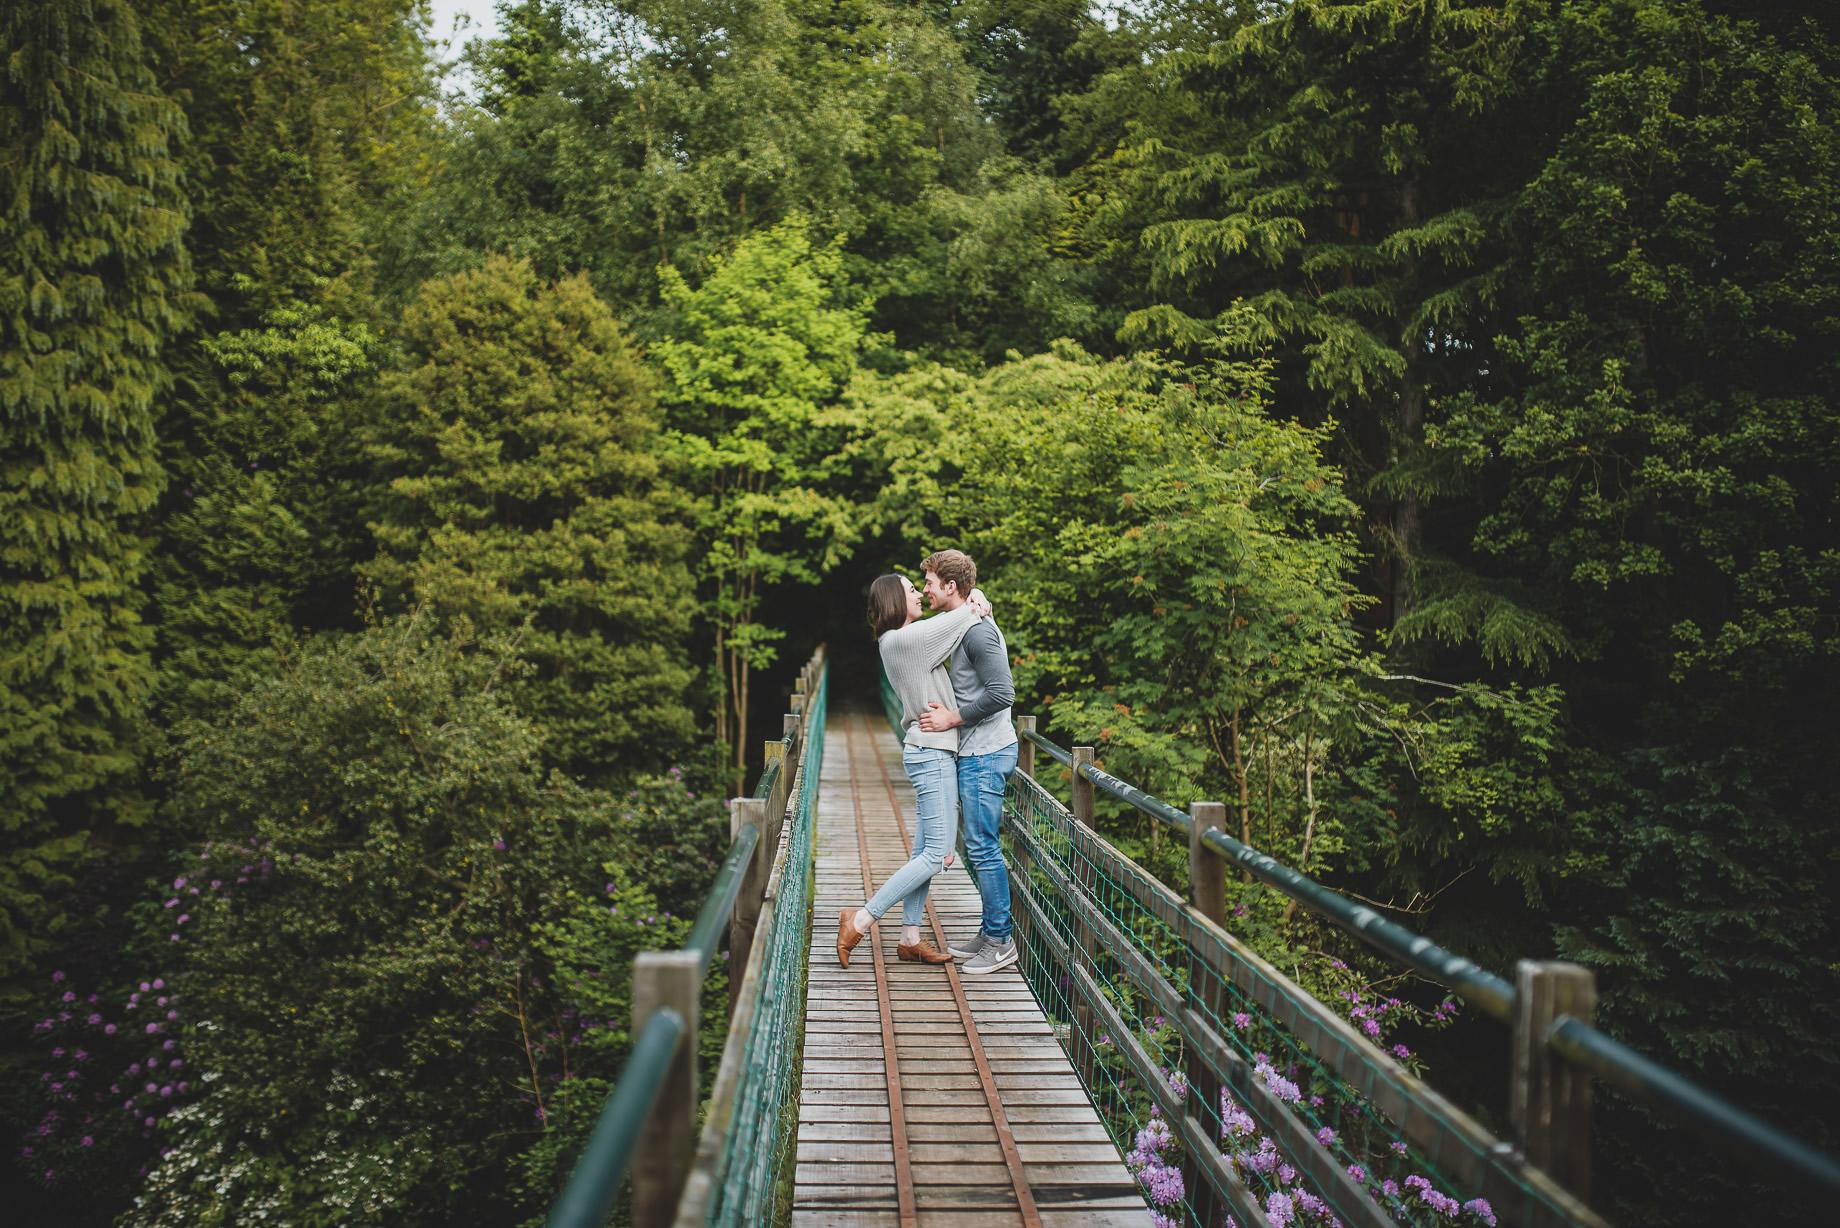 Becky and Emmett's Pre-Wedding Shoot in Scorton 007